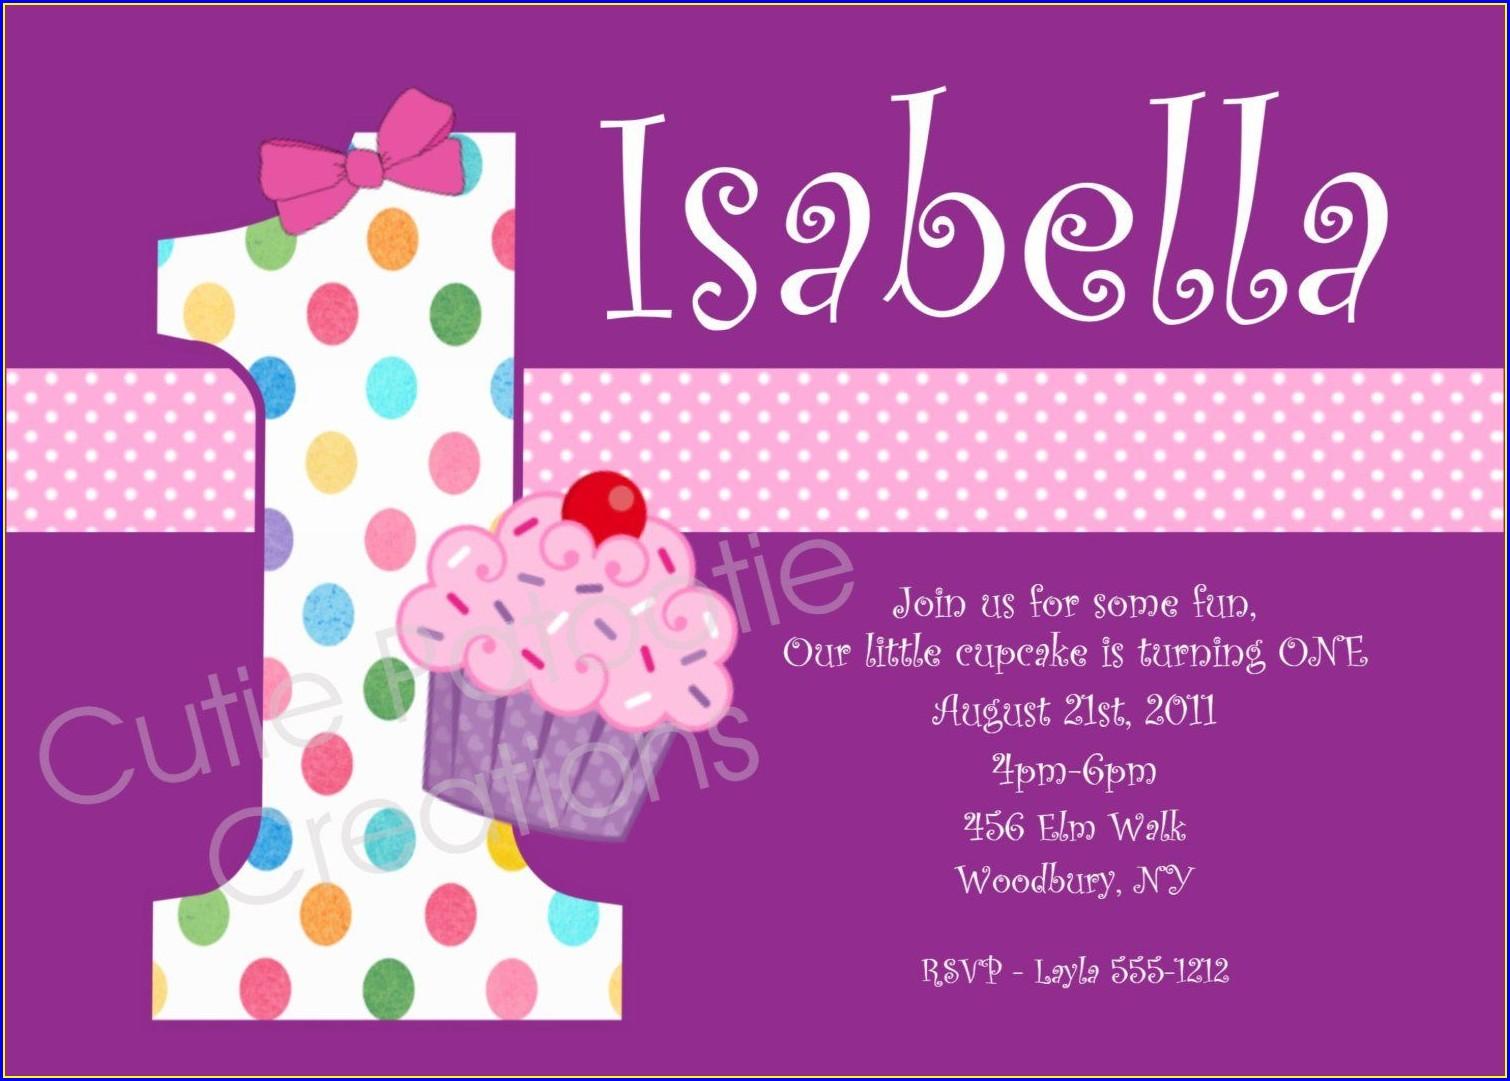 Funny Birthday Invitation Wording For Kids